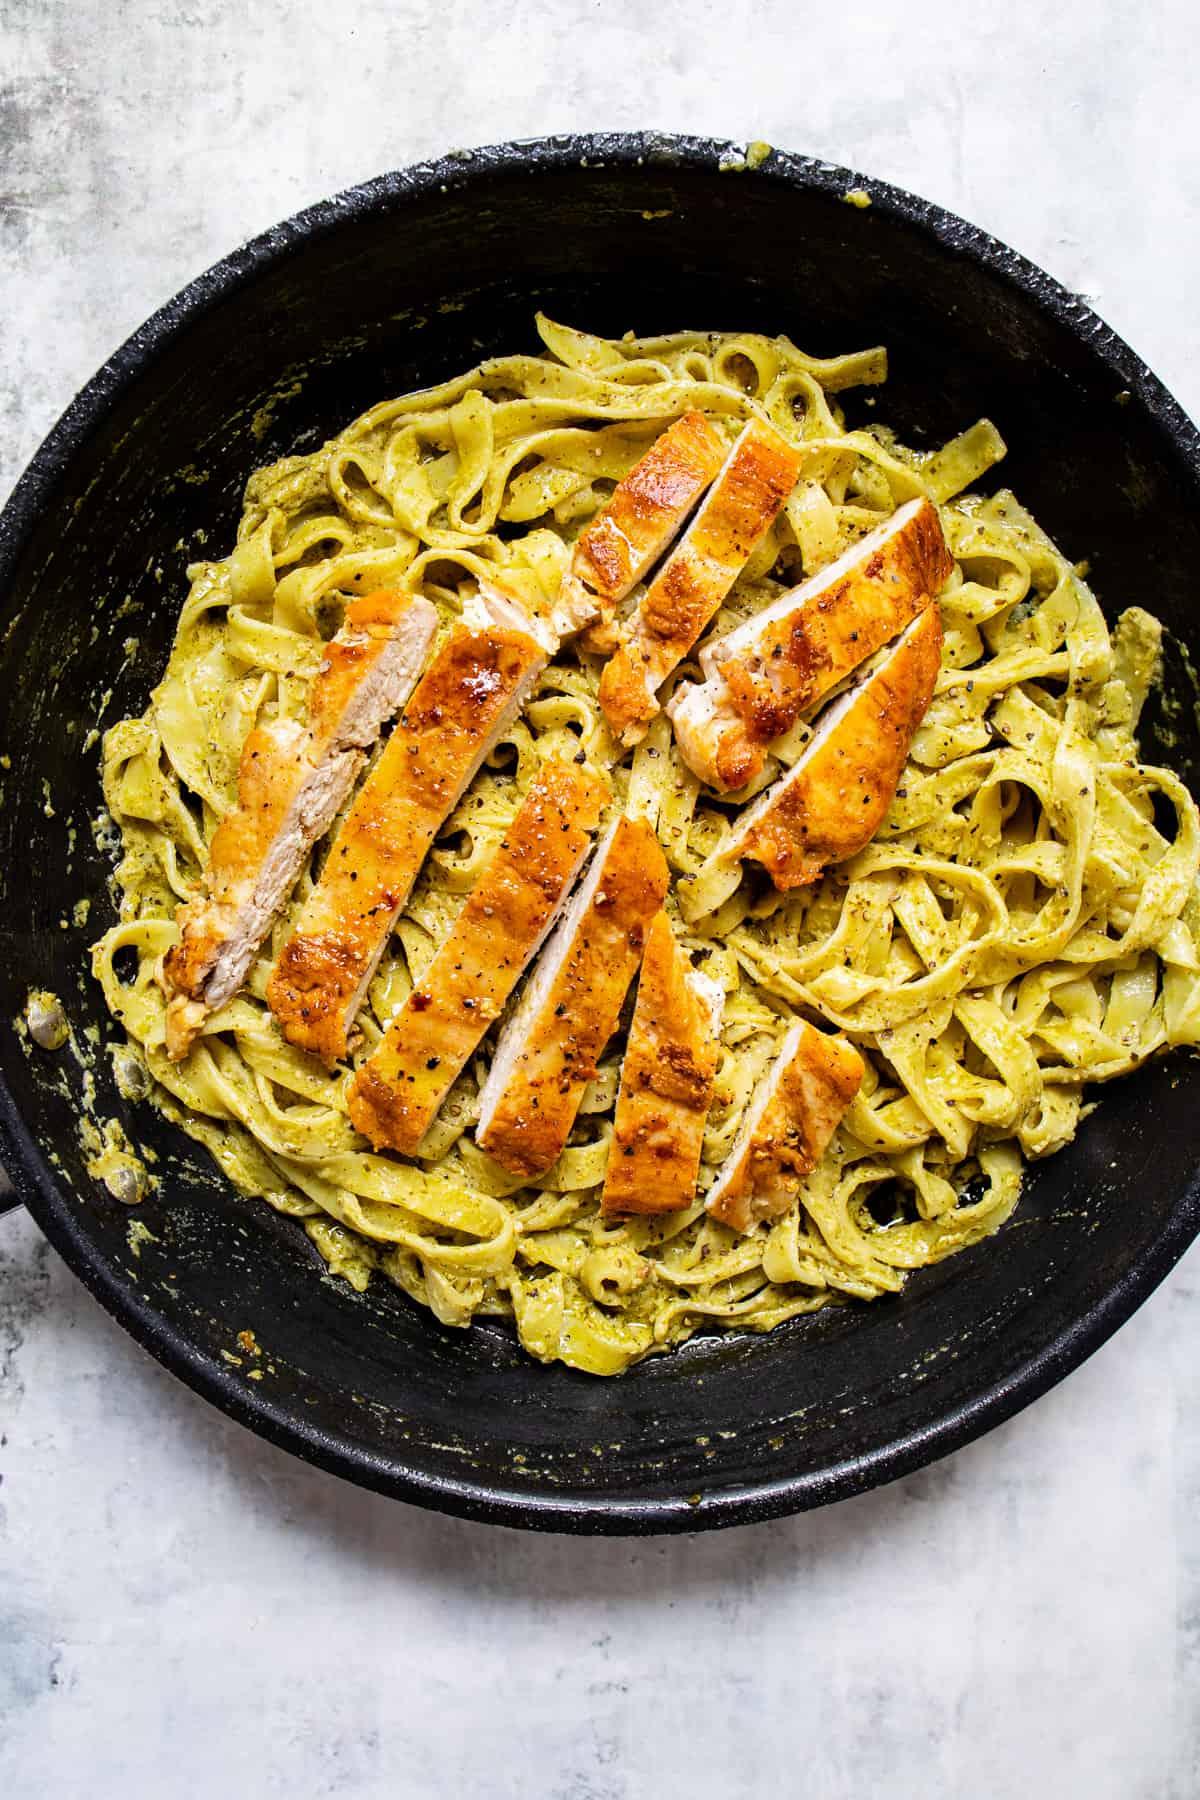 fried chicken over pesto pasta